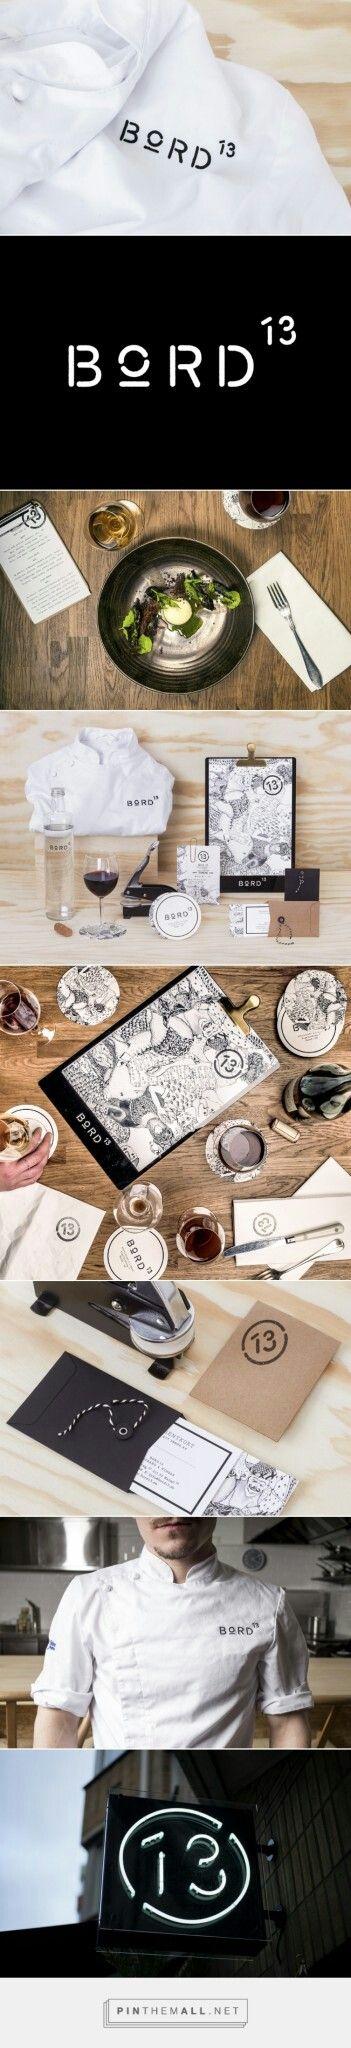 Bord 13 Branding by Snask| Fivestar Branding – Design and Branding Agency & Inspiration Gallery